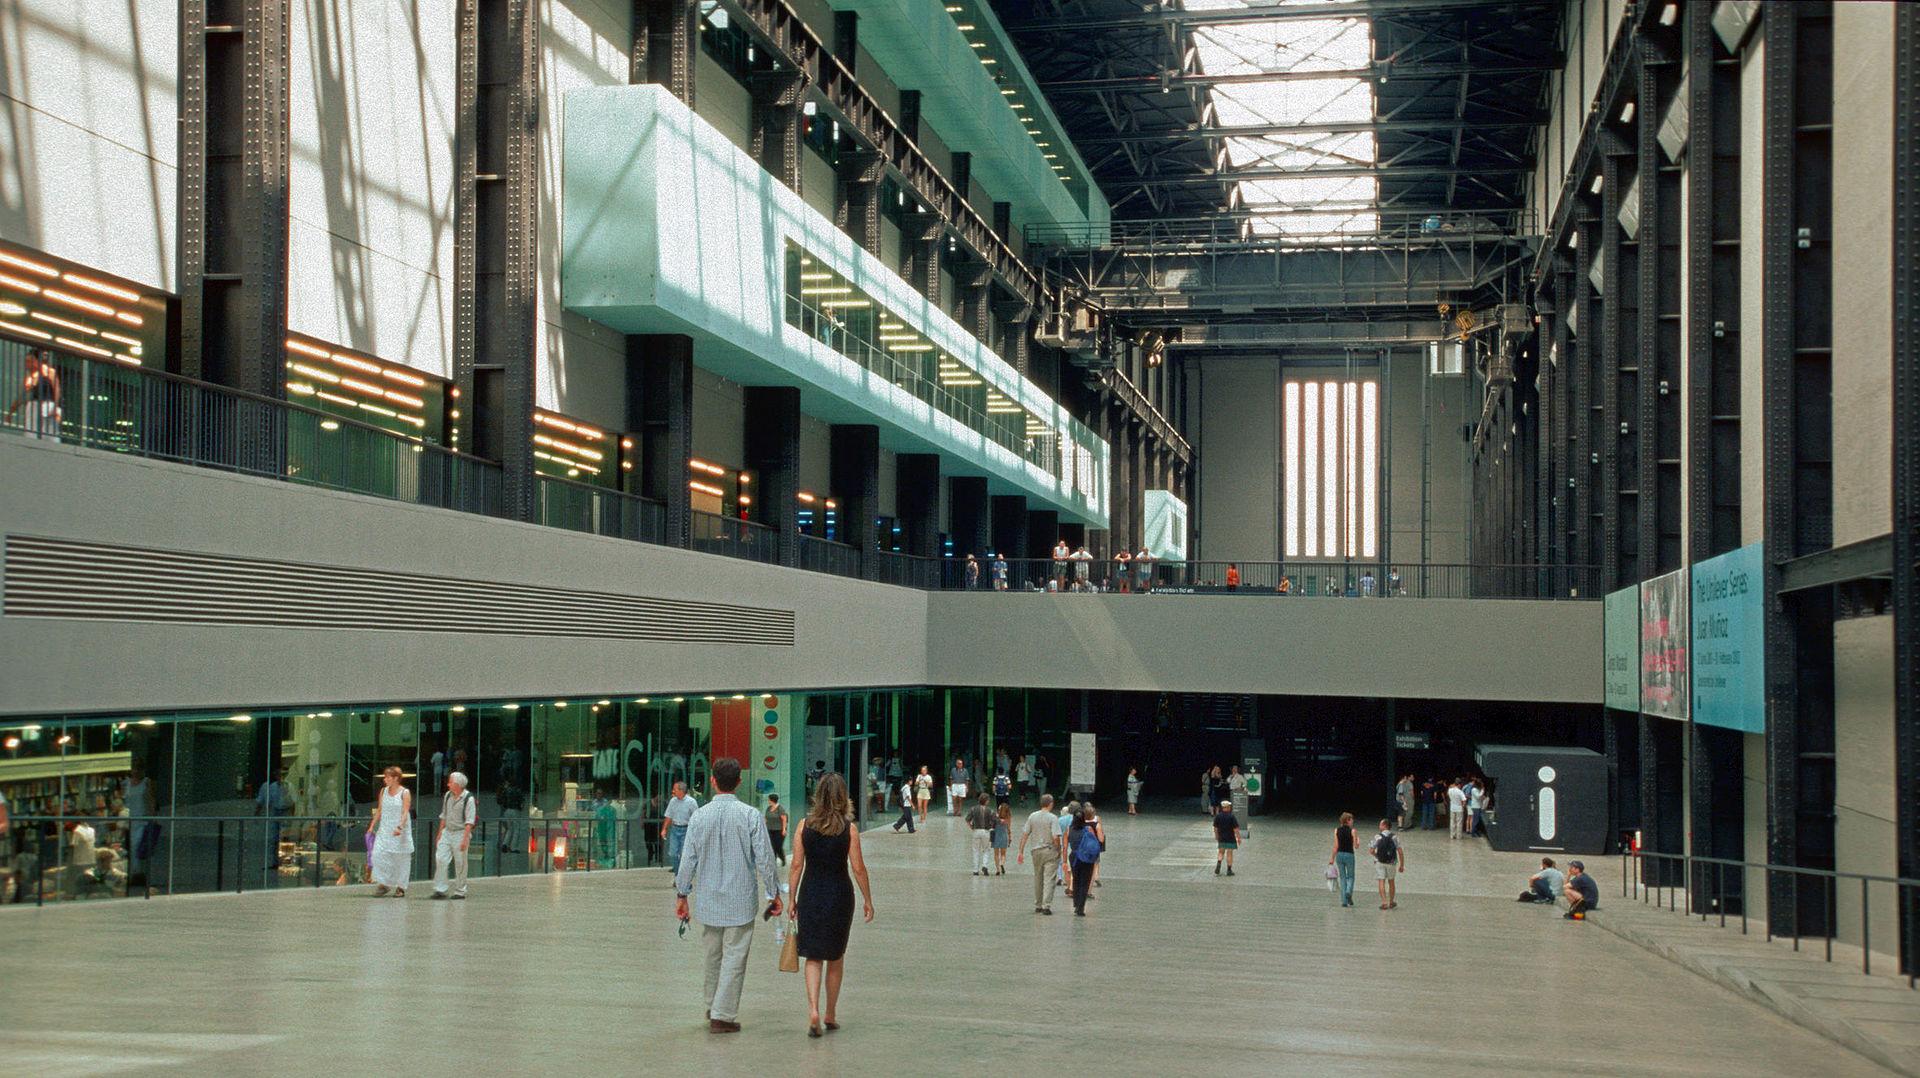 Len Modern tate modern s building named after us uk philanthropist len